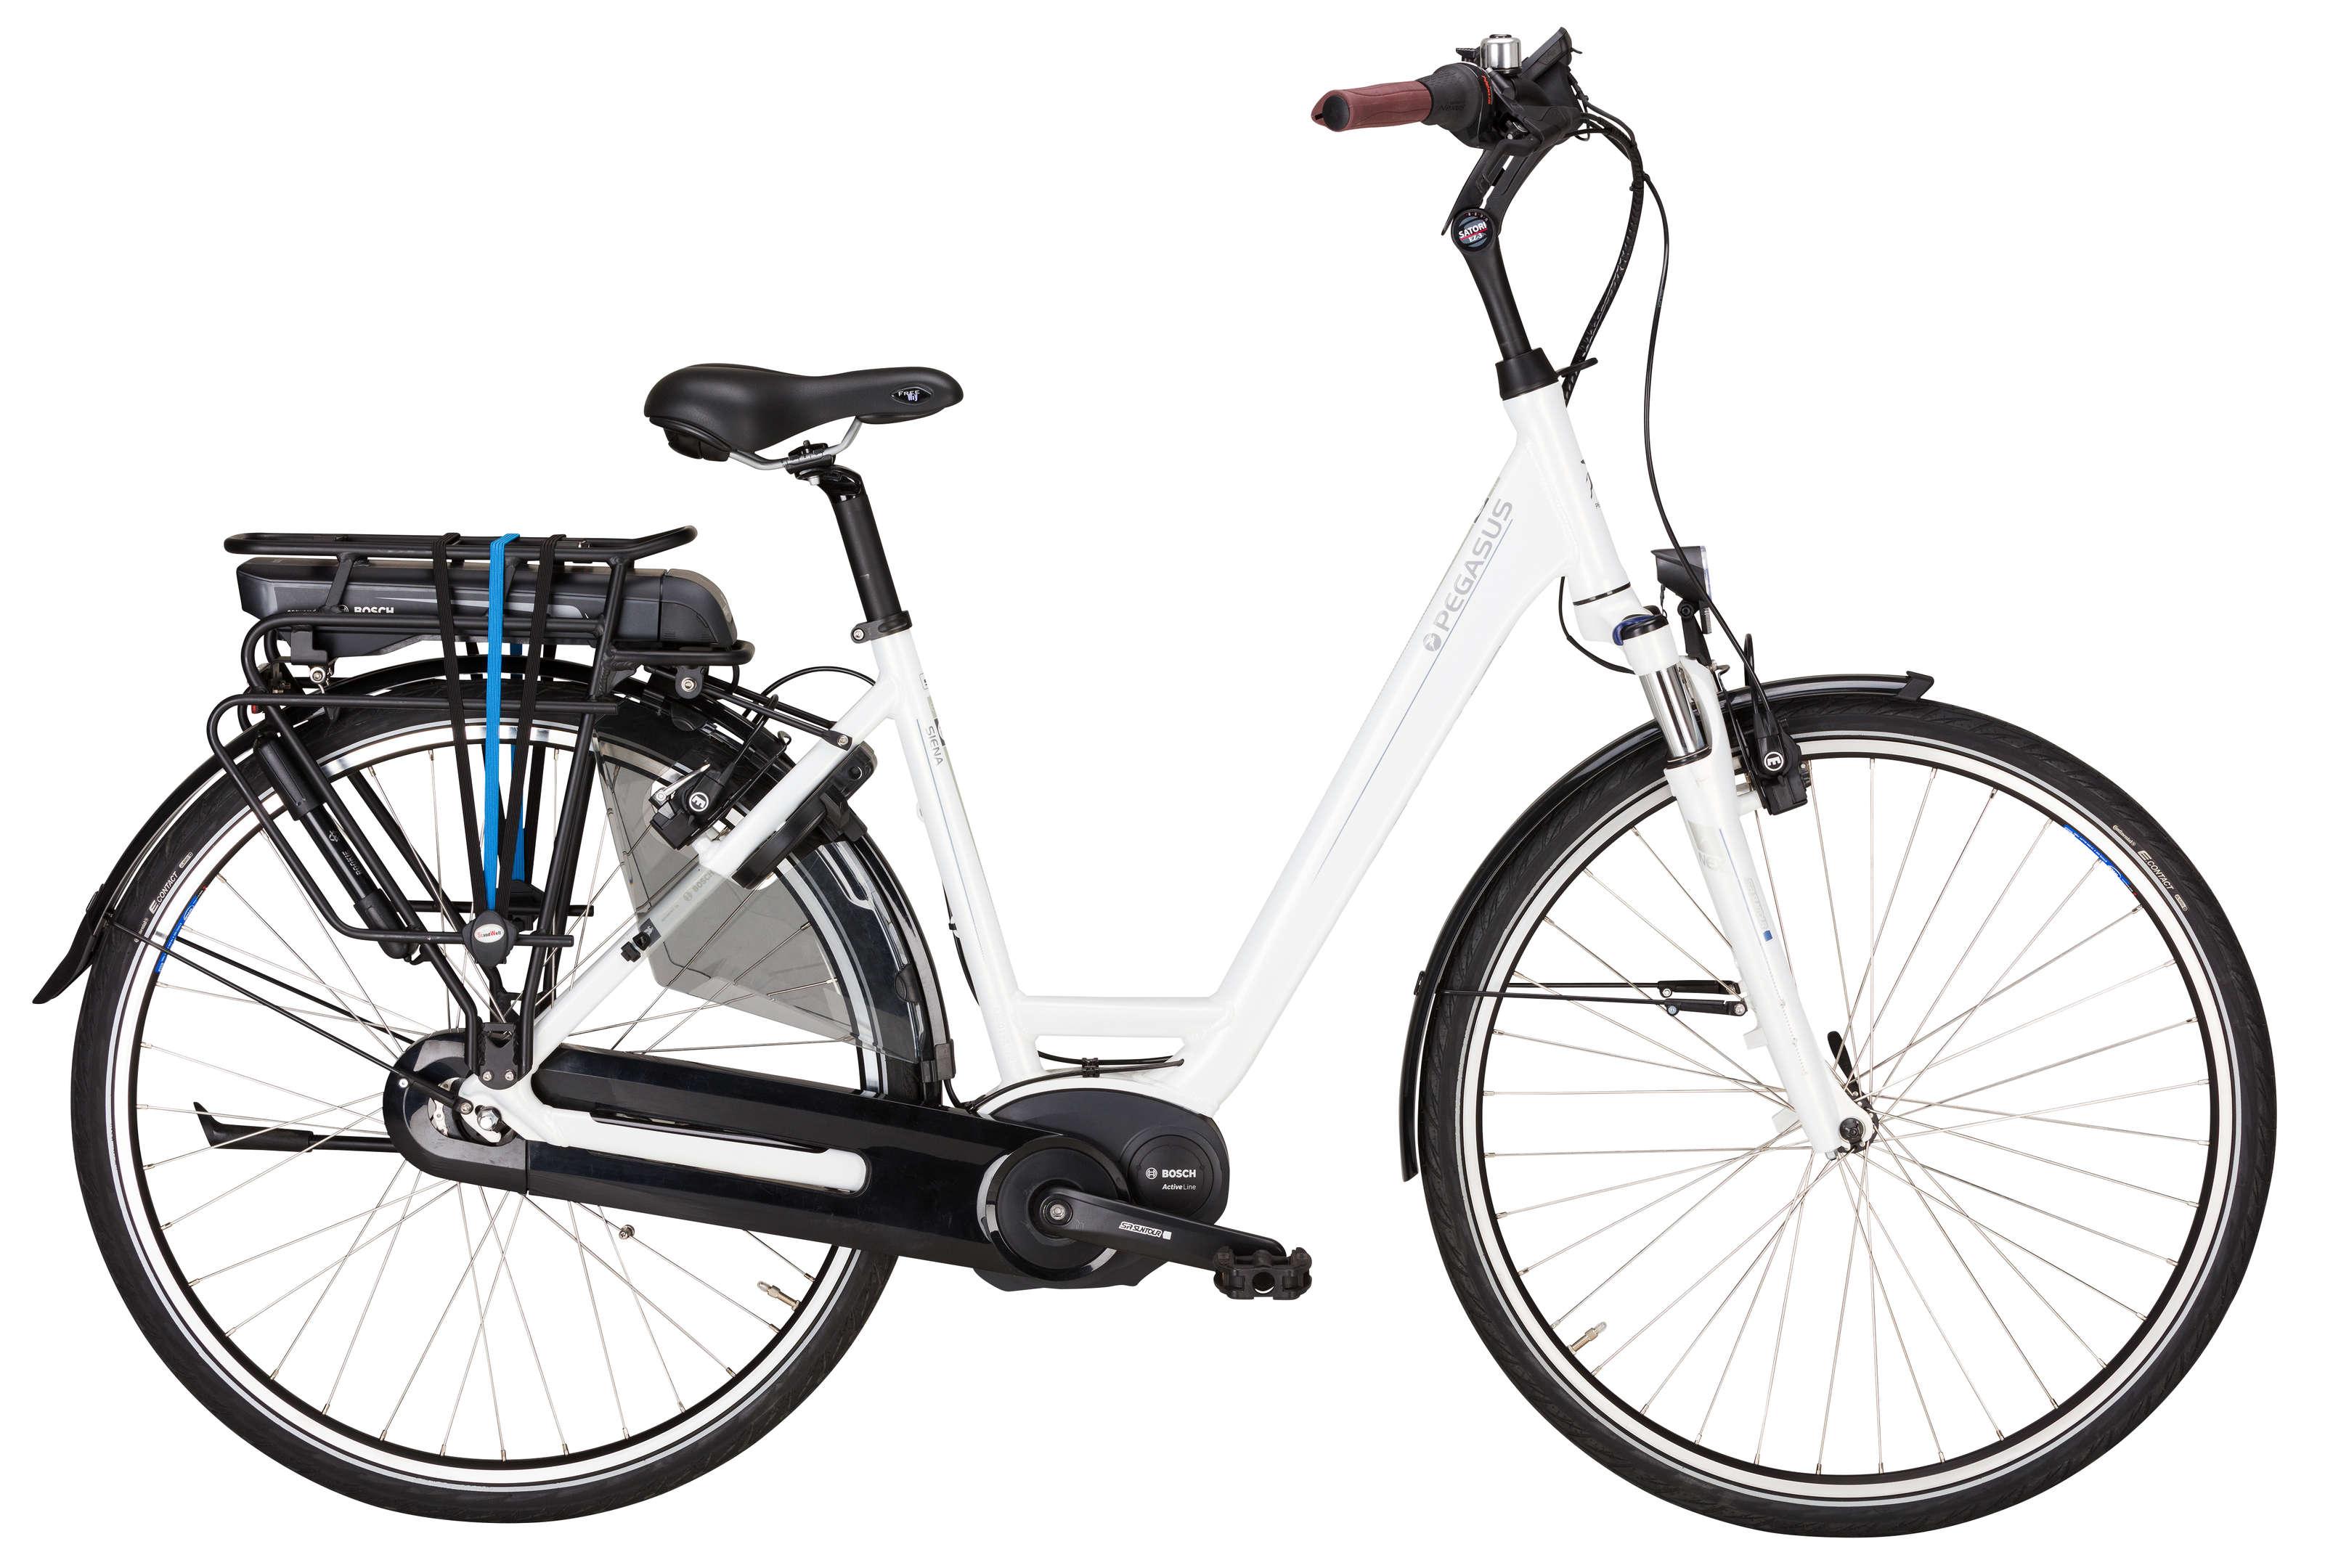 pegasus e bike siena eurorad bikeleasingeurorad bikeleasing. Black Bedroom Furniture Sets. Home Design Ideas